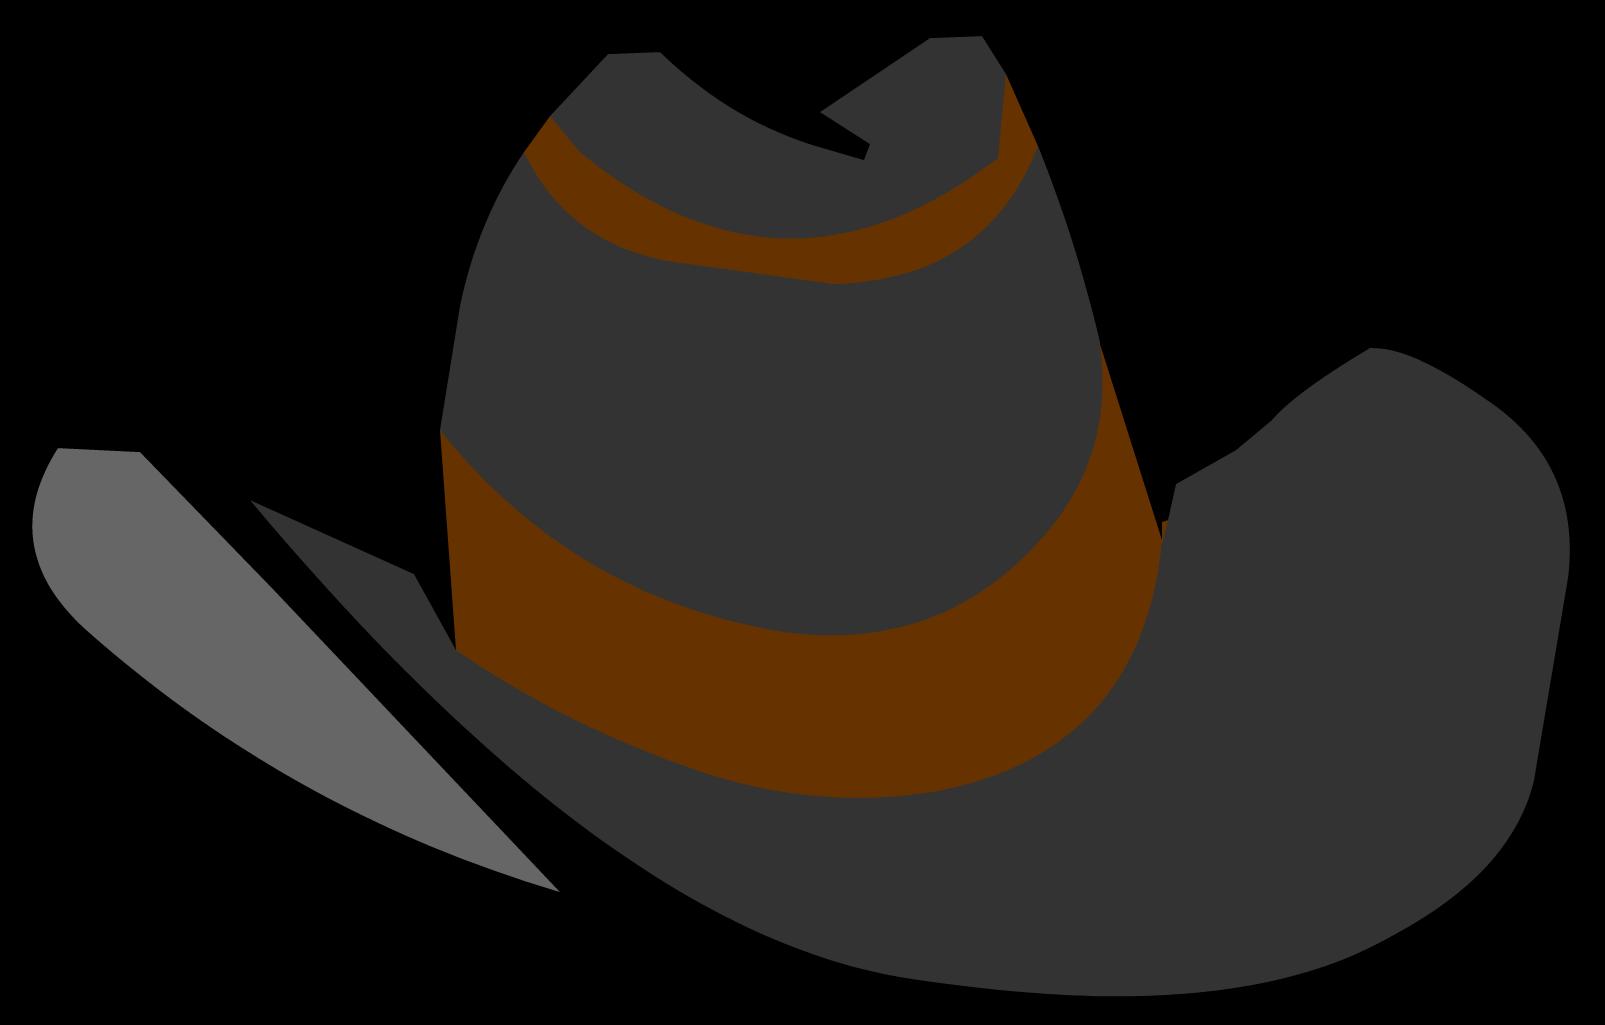 Hats clipart cow boy. Black cowboy hat club